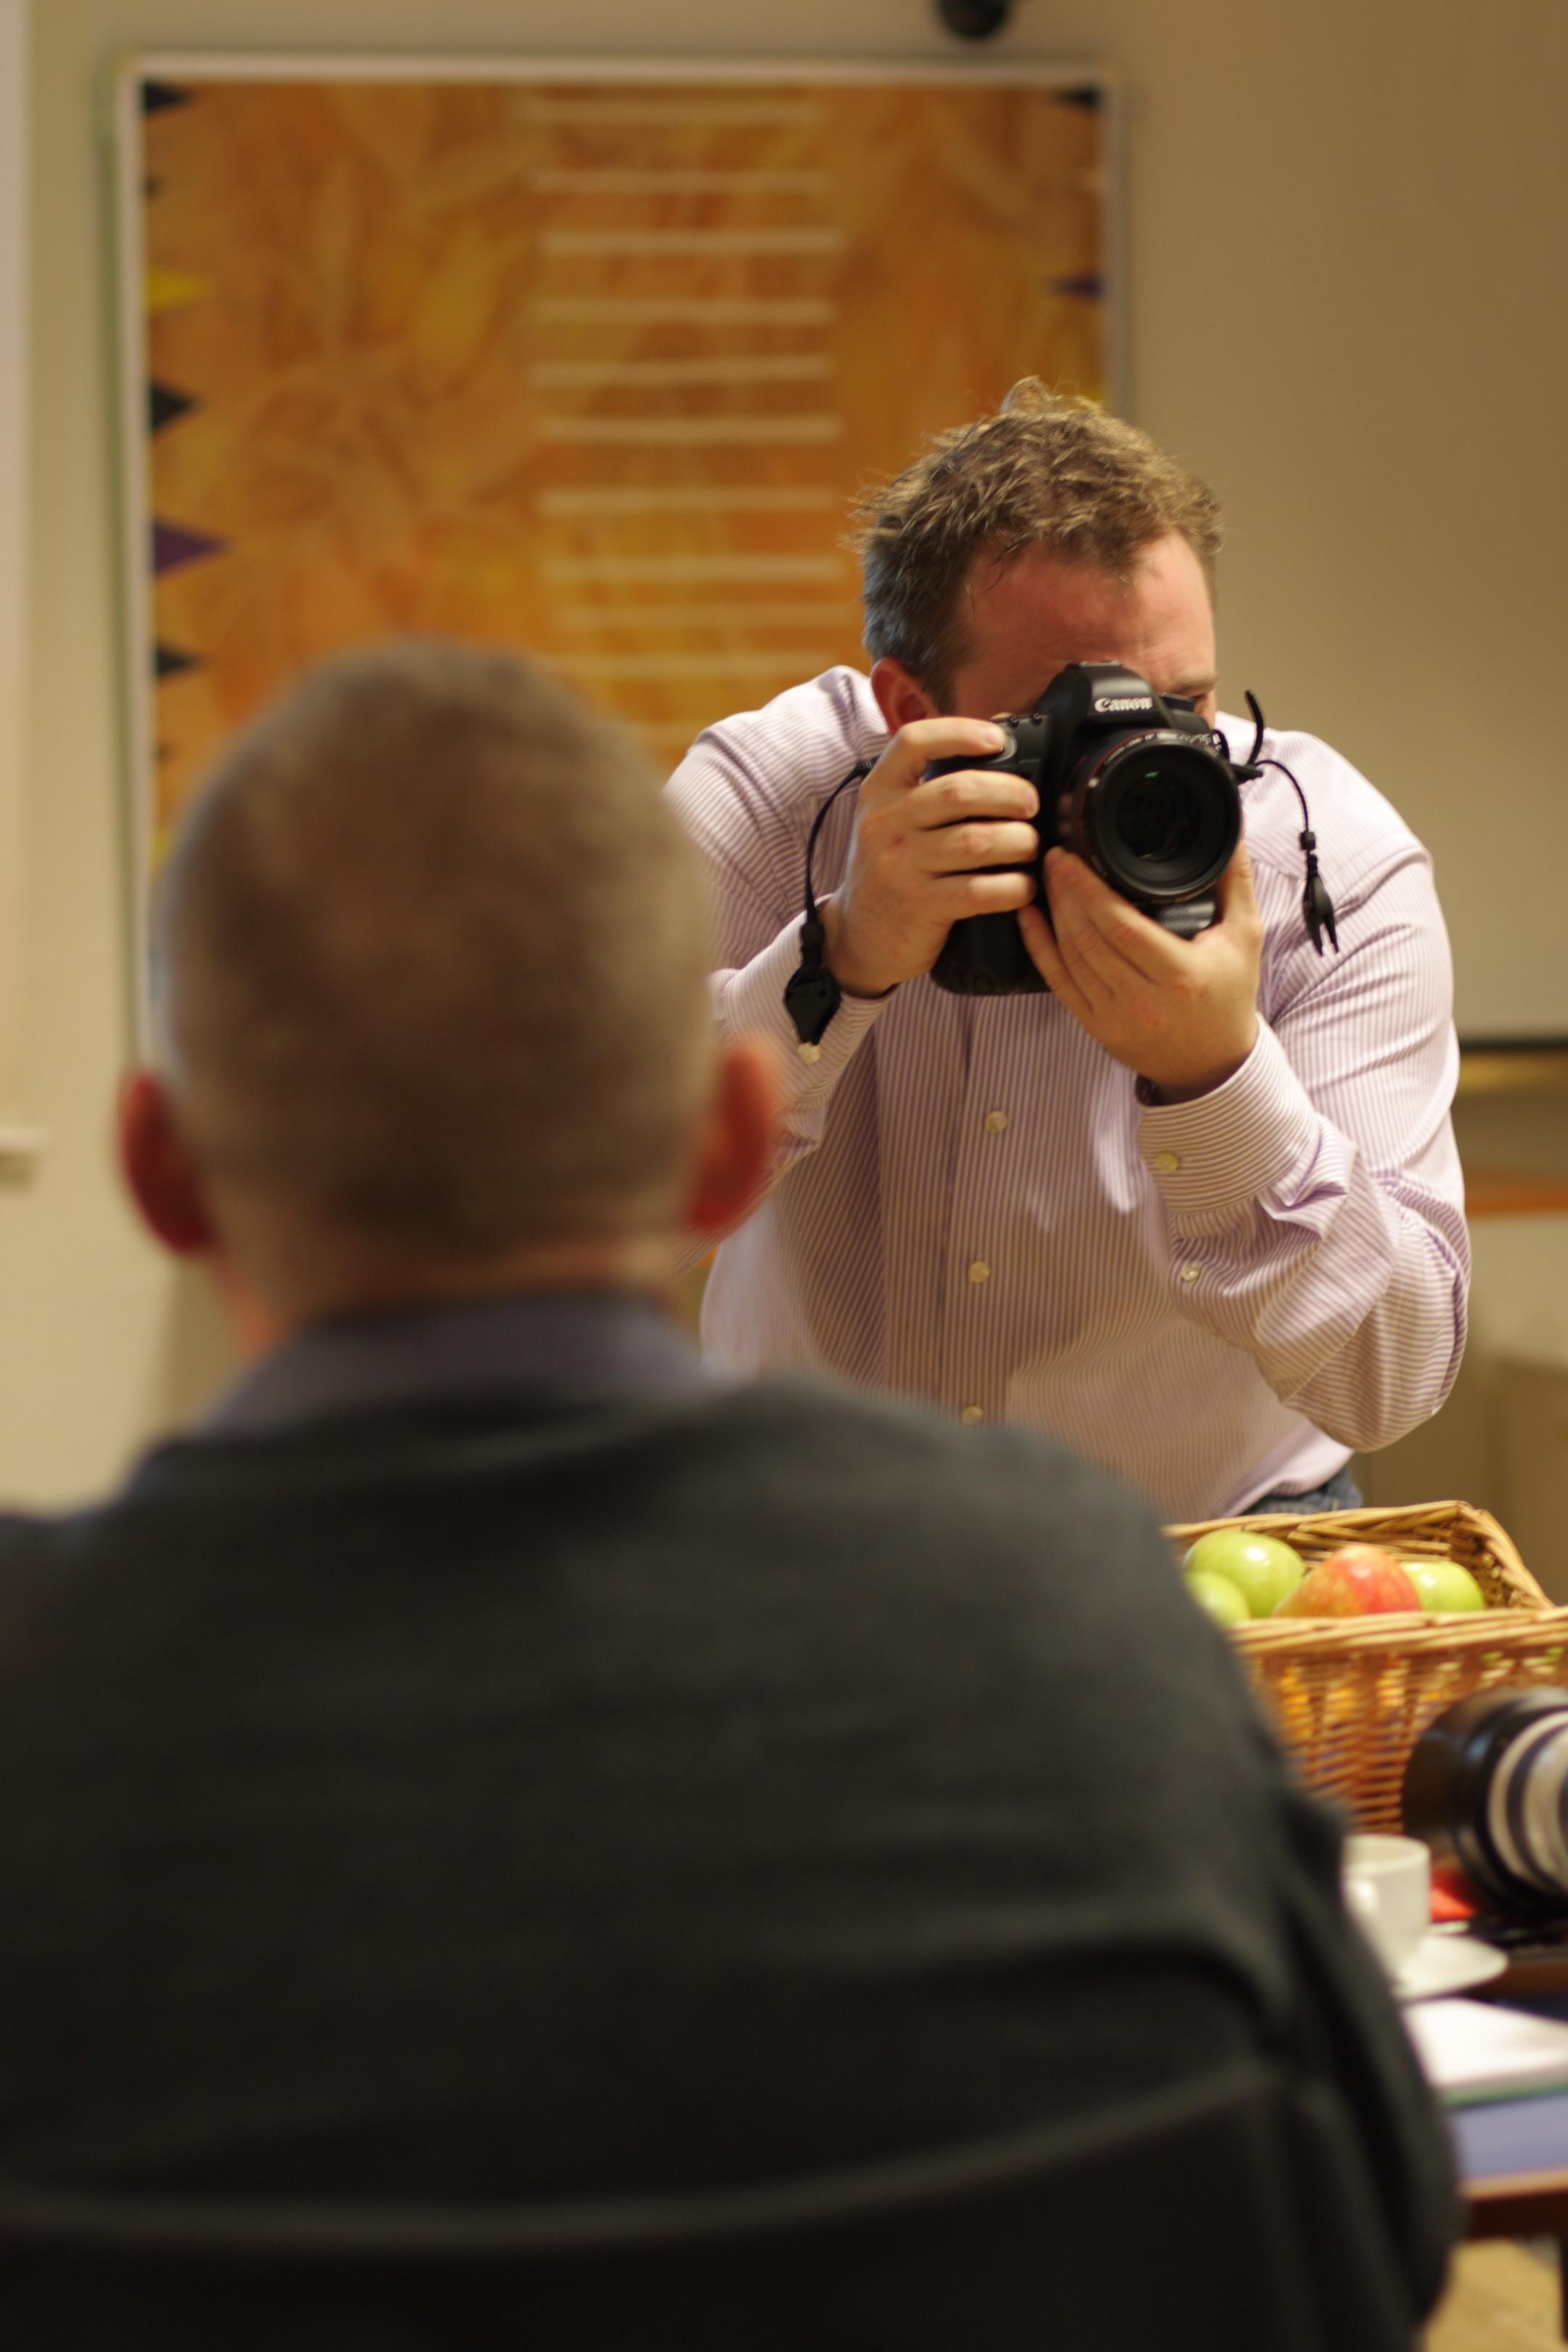 Canon EOS kursus med Kim Skovsby